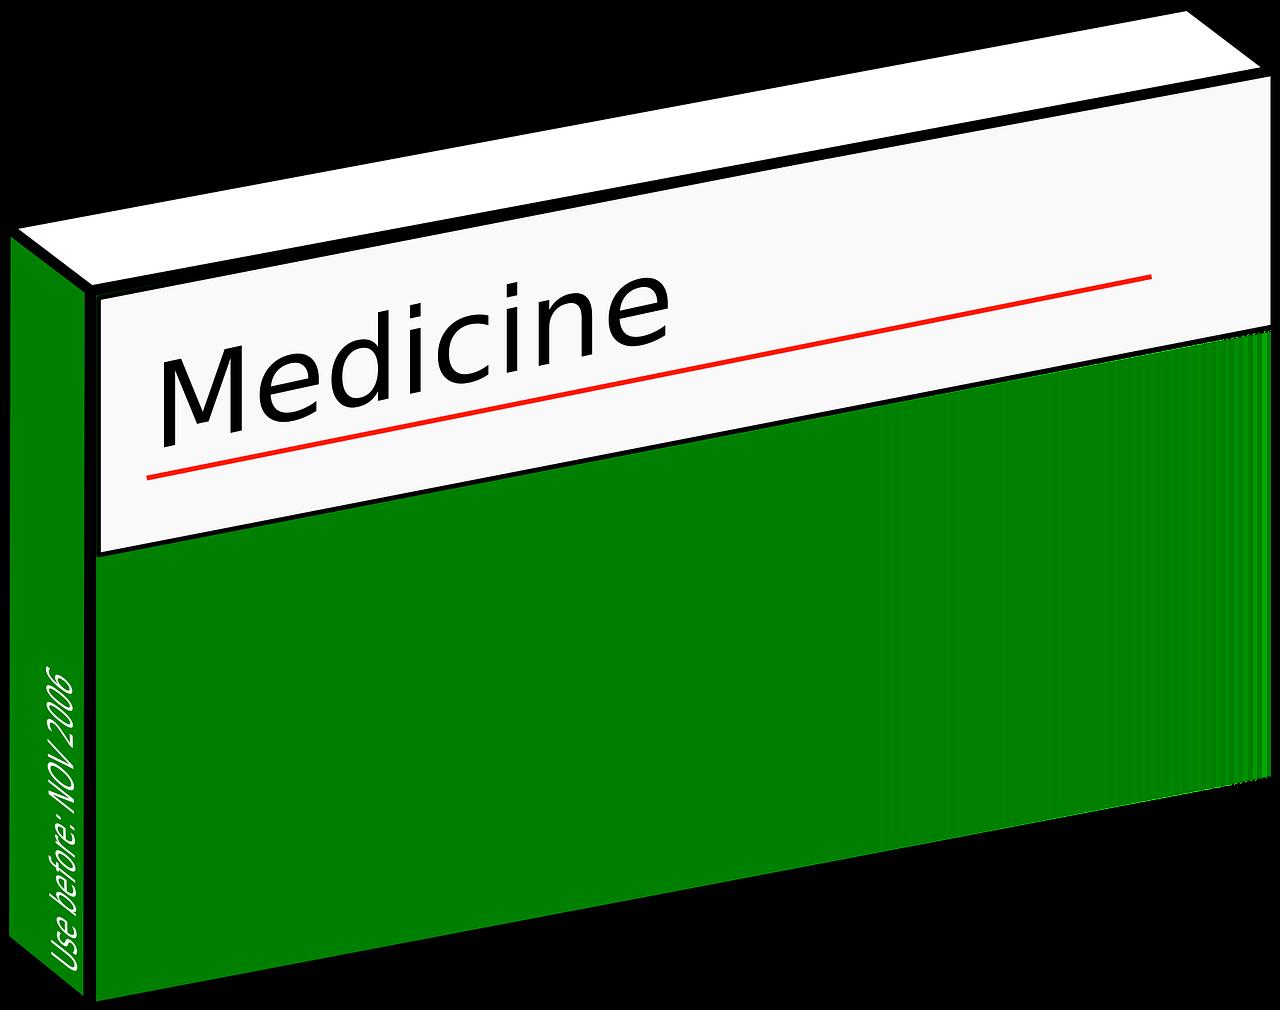 1280x1010 Free To Use Amp Public Domain Medicine Clip Art